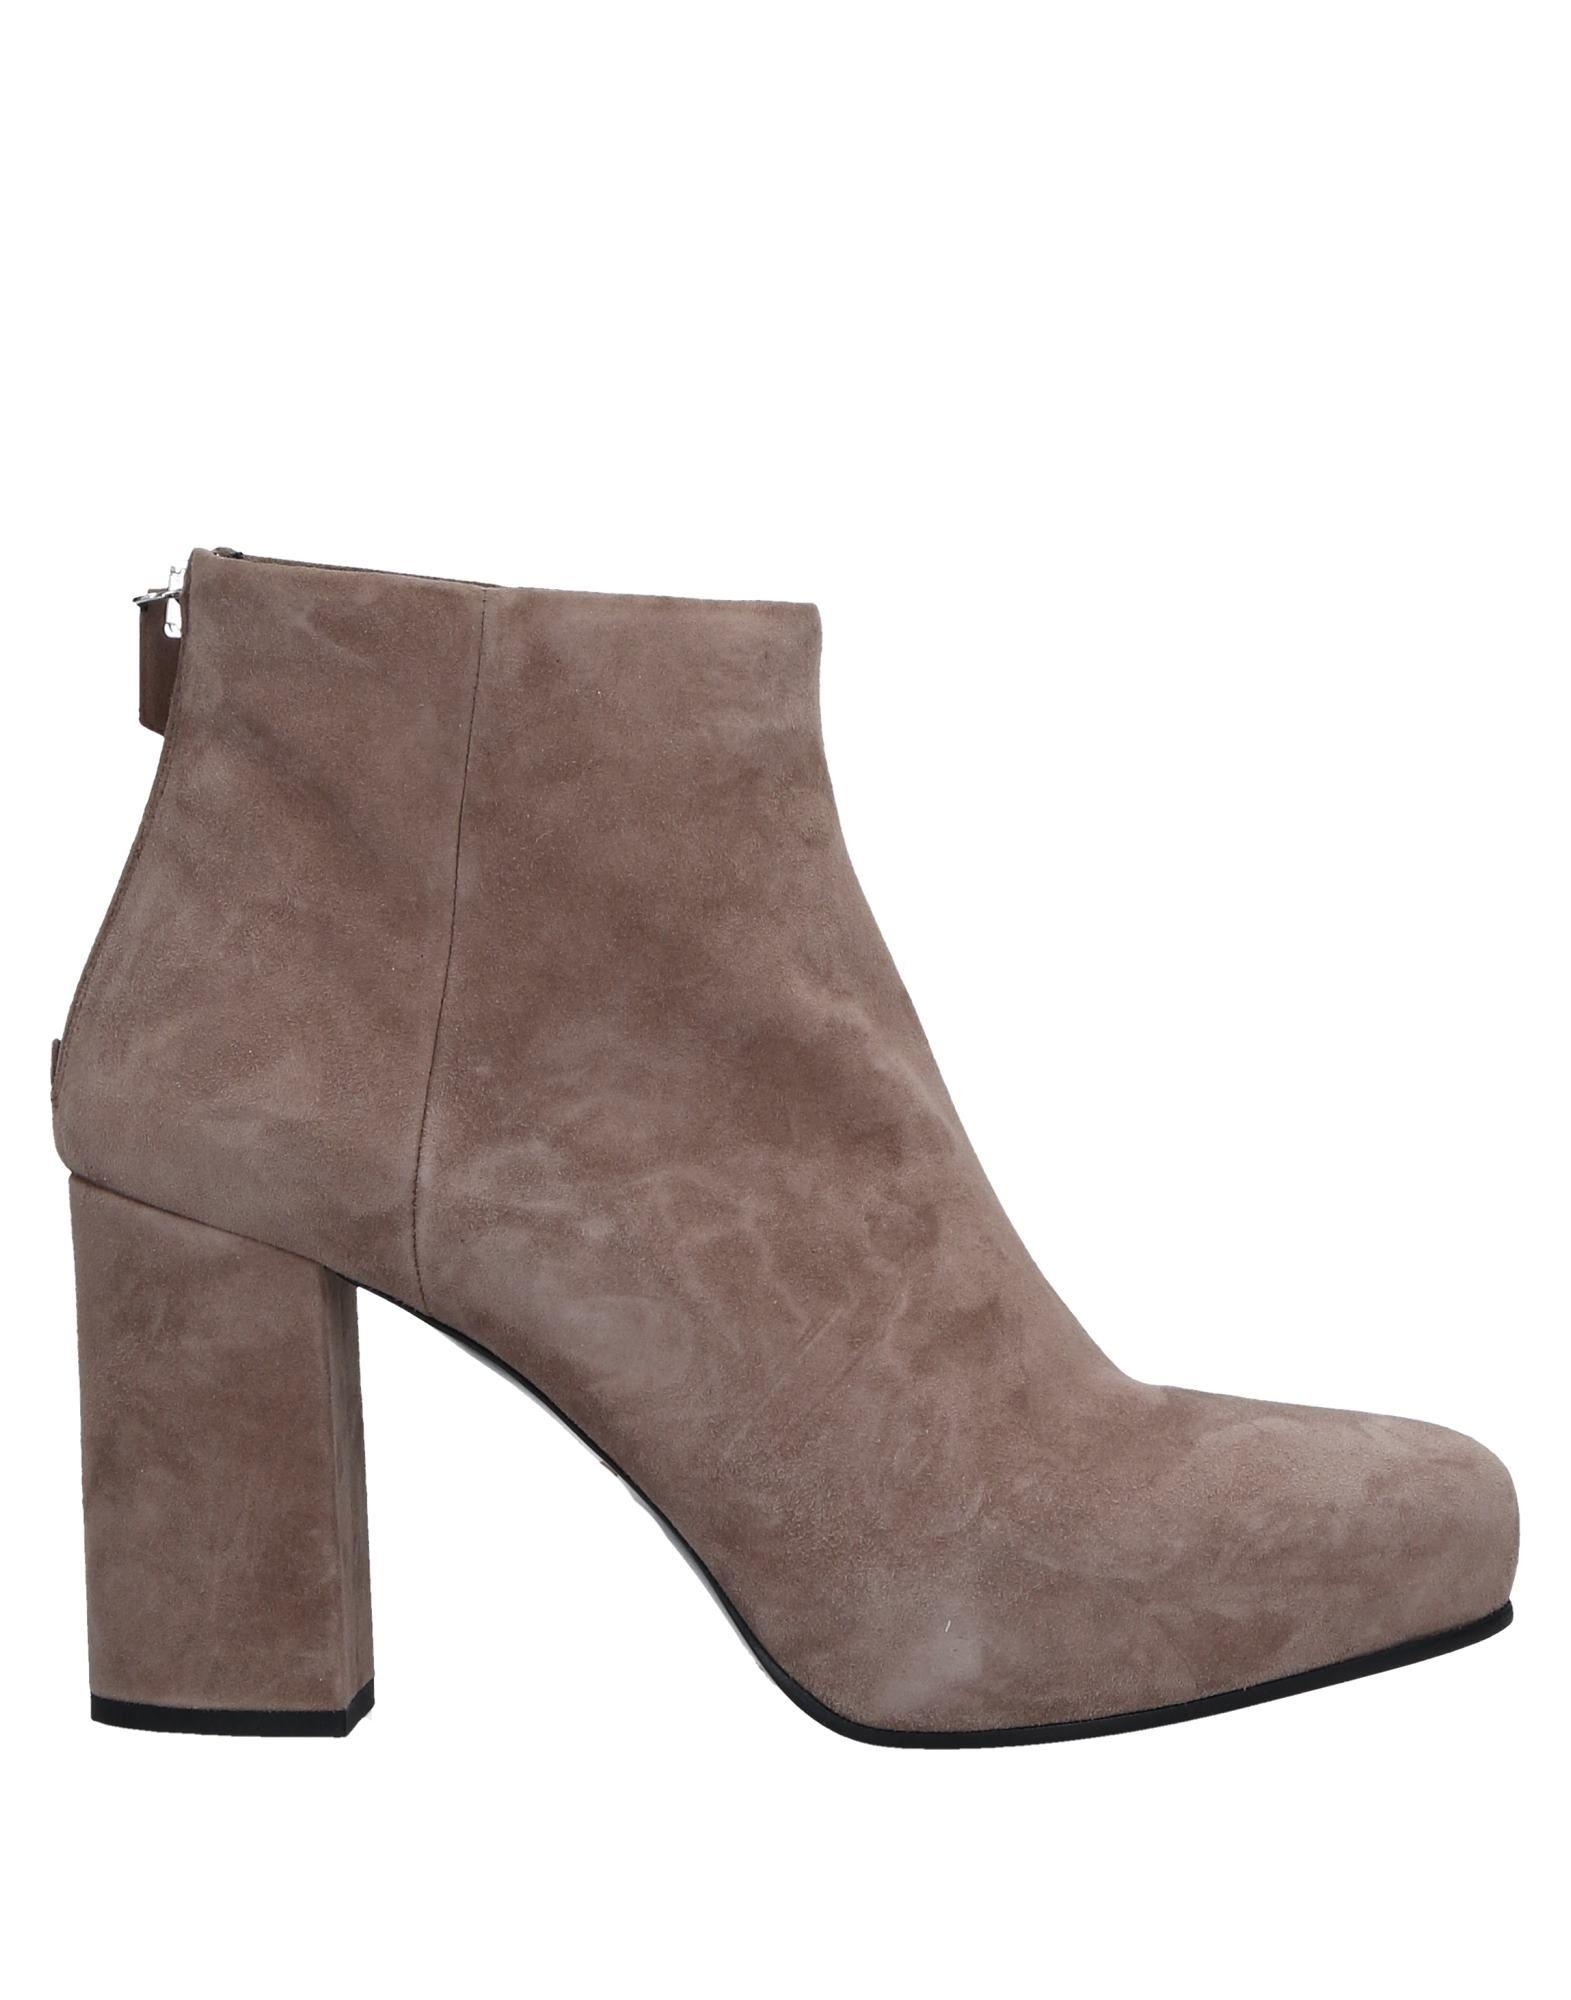 Prada Prada Ankle Boot - Women Prada Prada Ankle Boots online on  United Kingdom - 11233059UF 984aa1